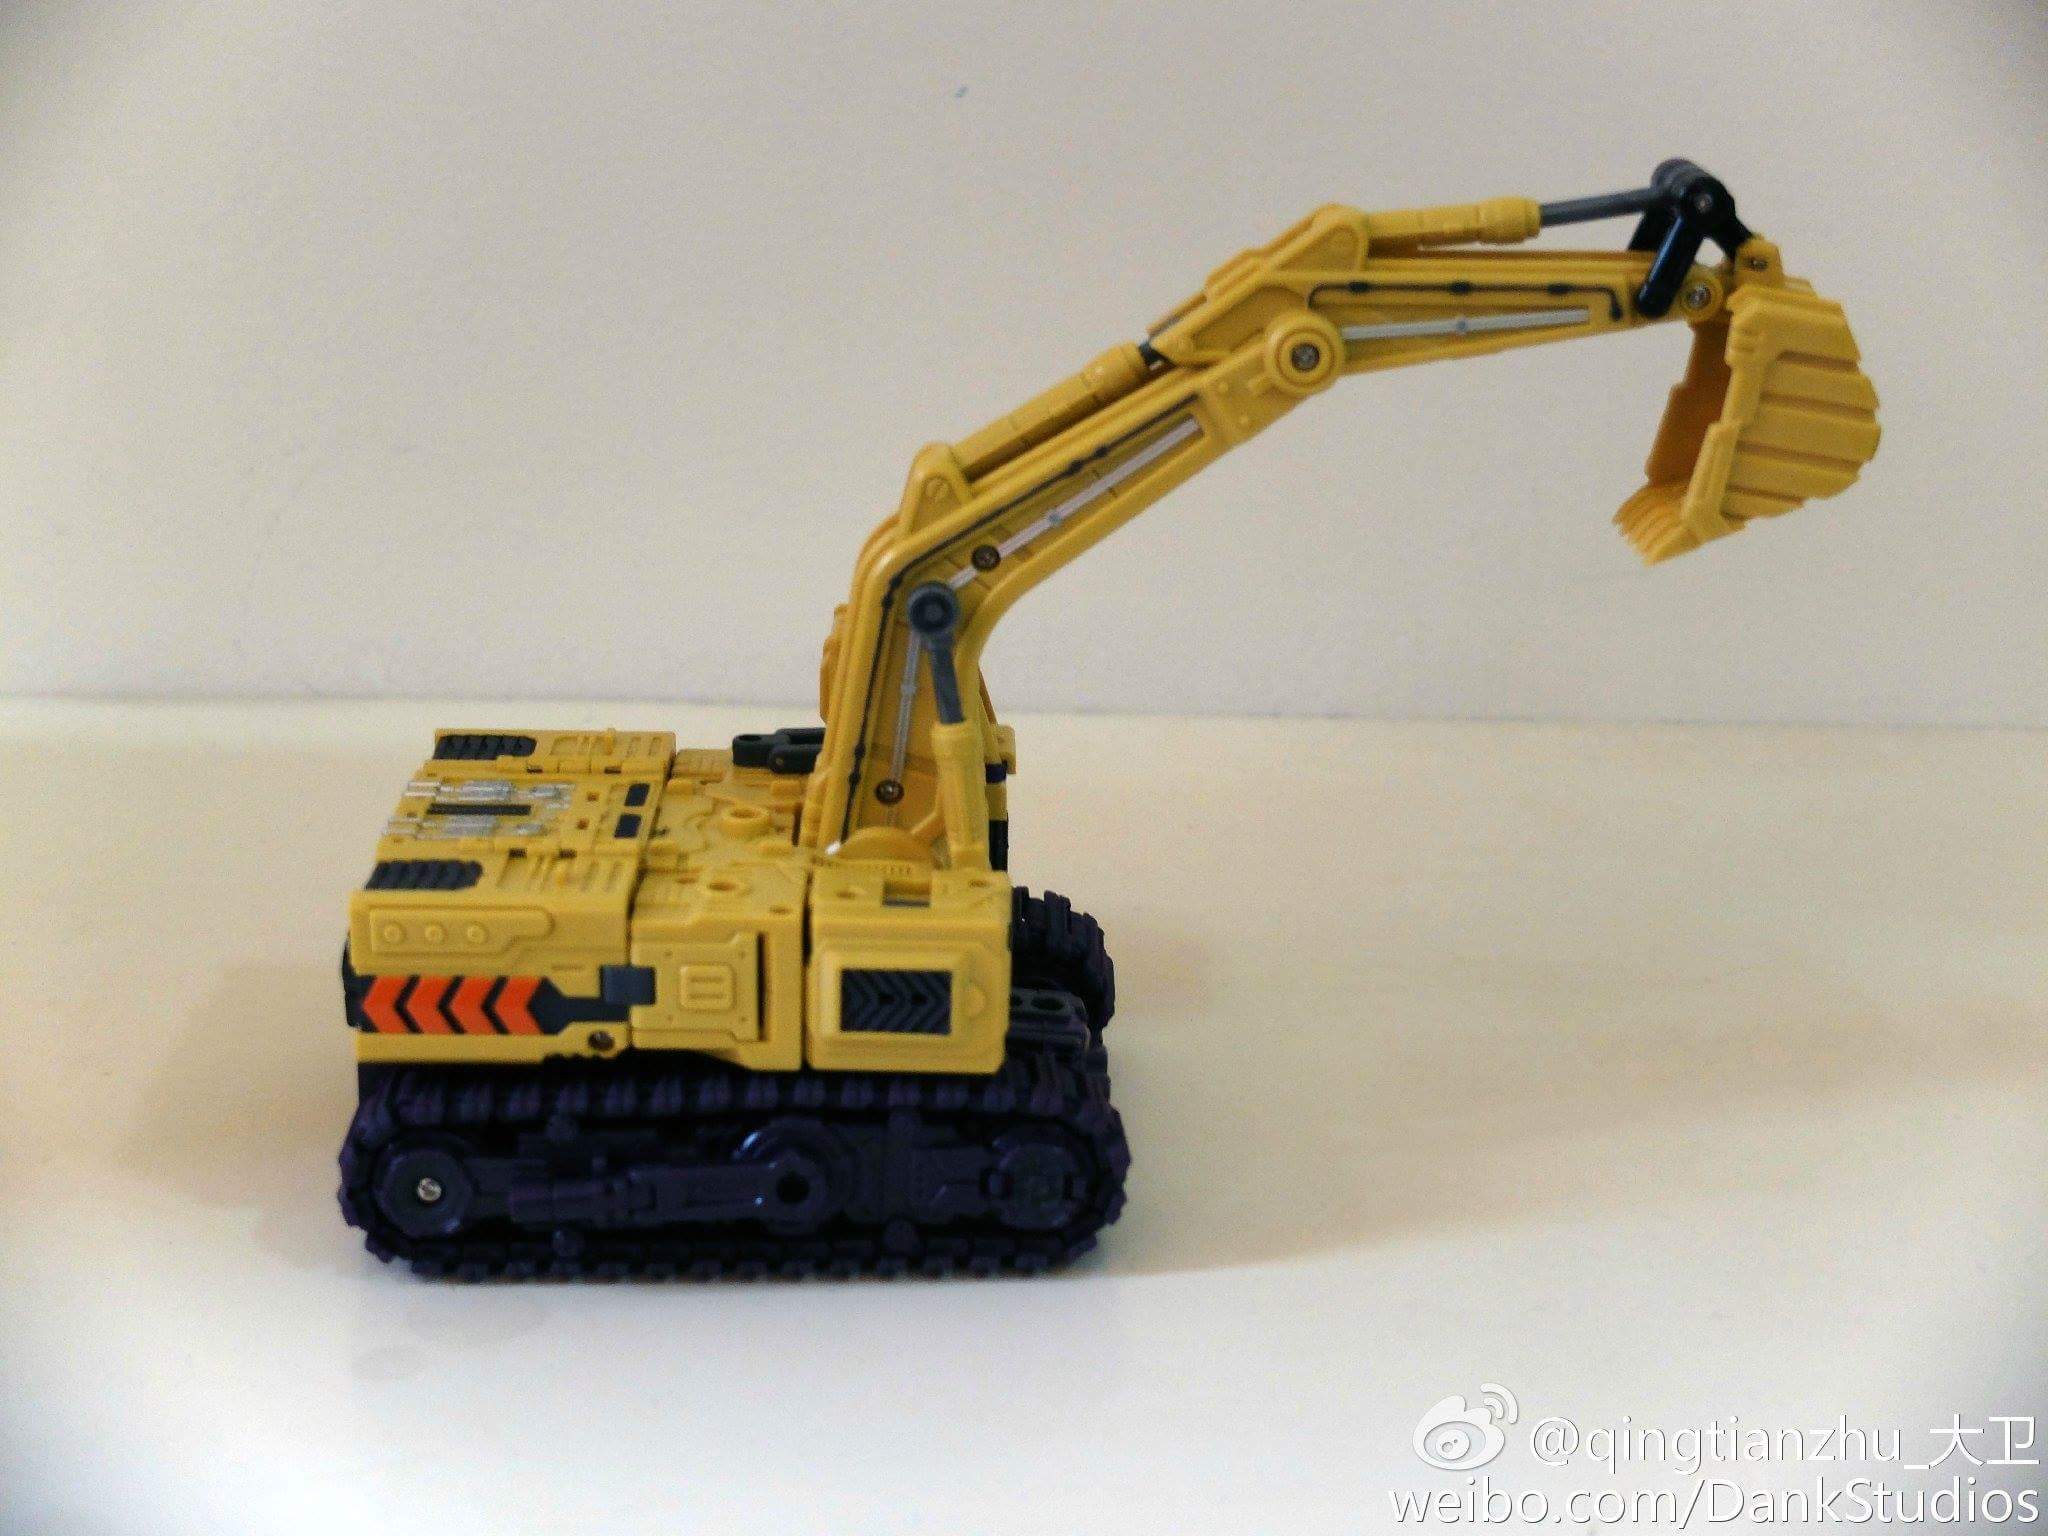 [Toyworld] Produit Tiers - Jouet TW-C Constructor aka Devastator/Dévastateur (Version vert G1 et jaune G2) - Page 8 VRha38r0